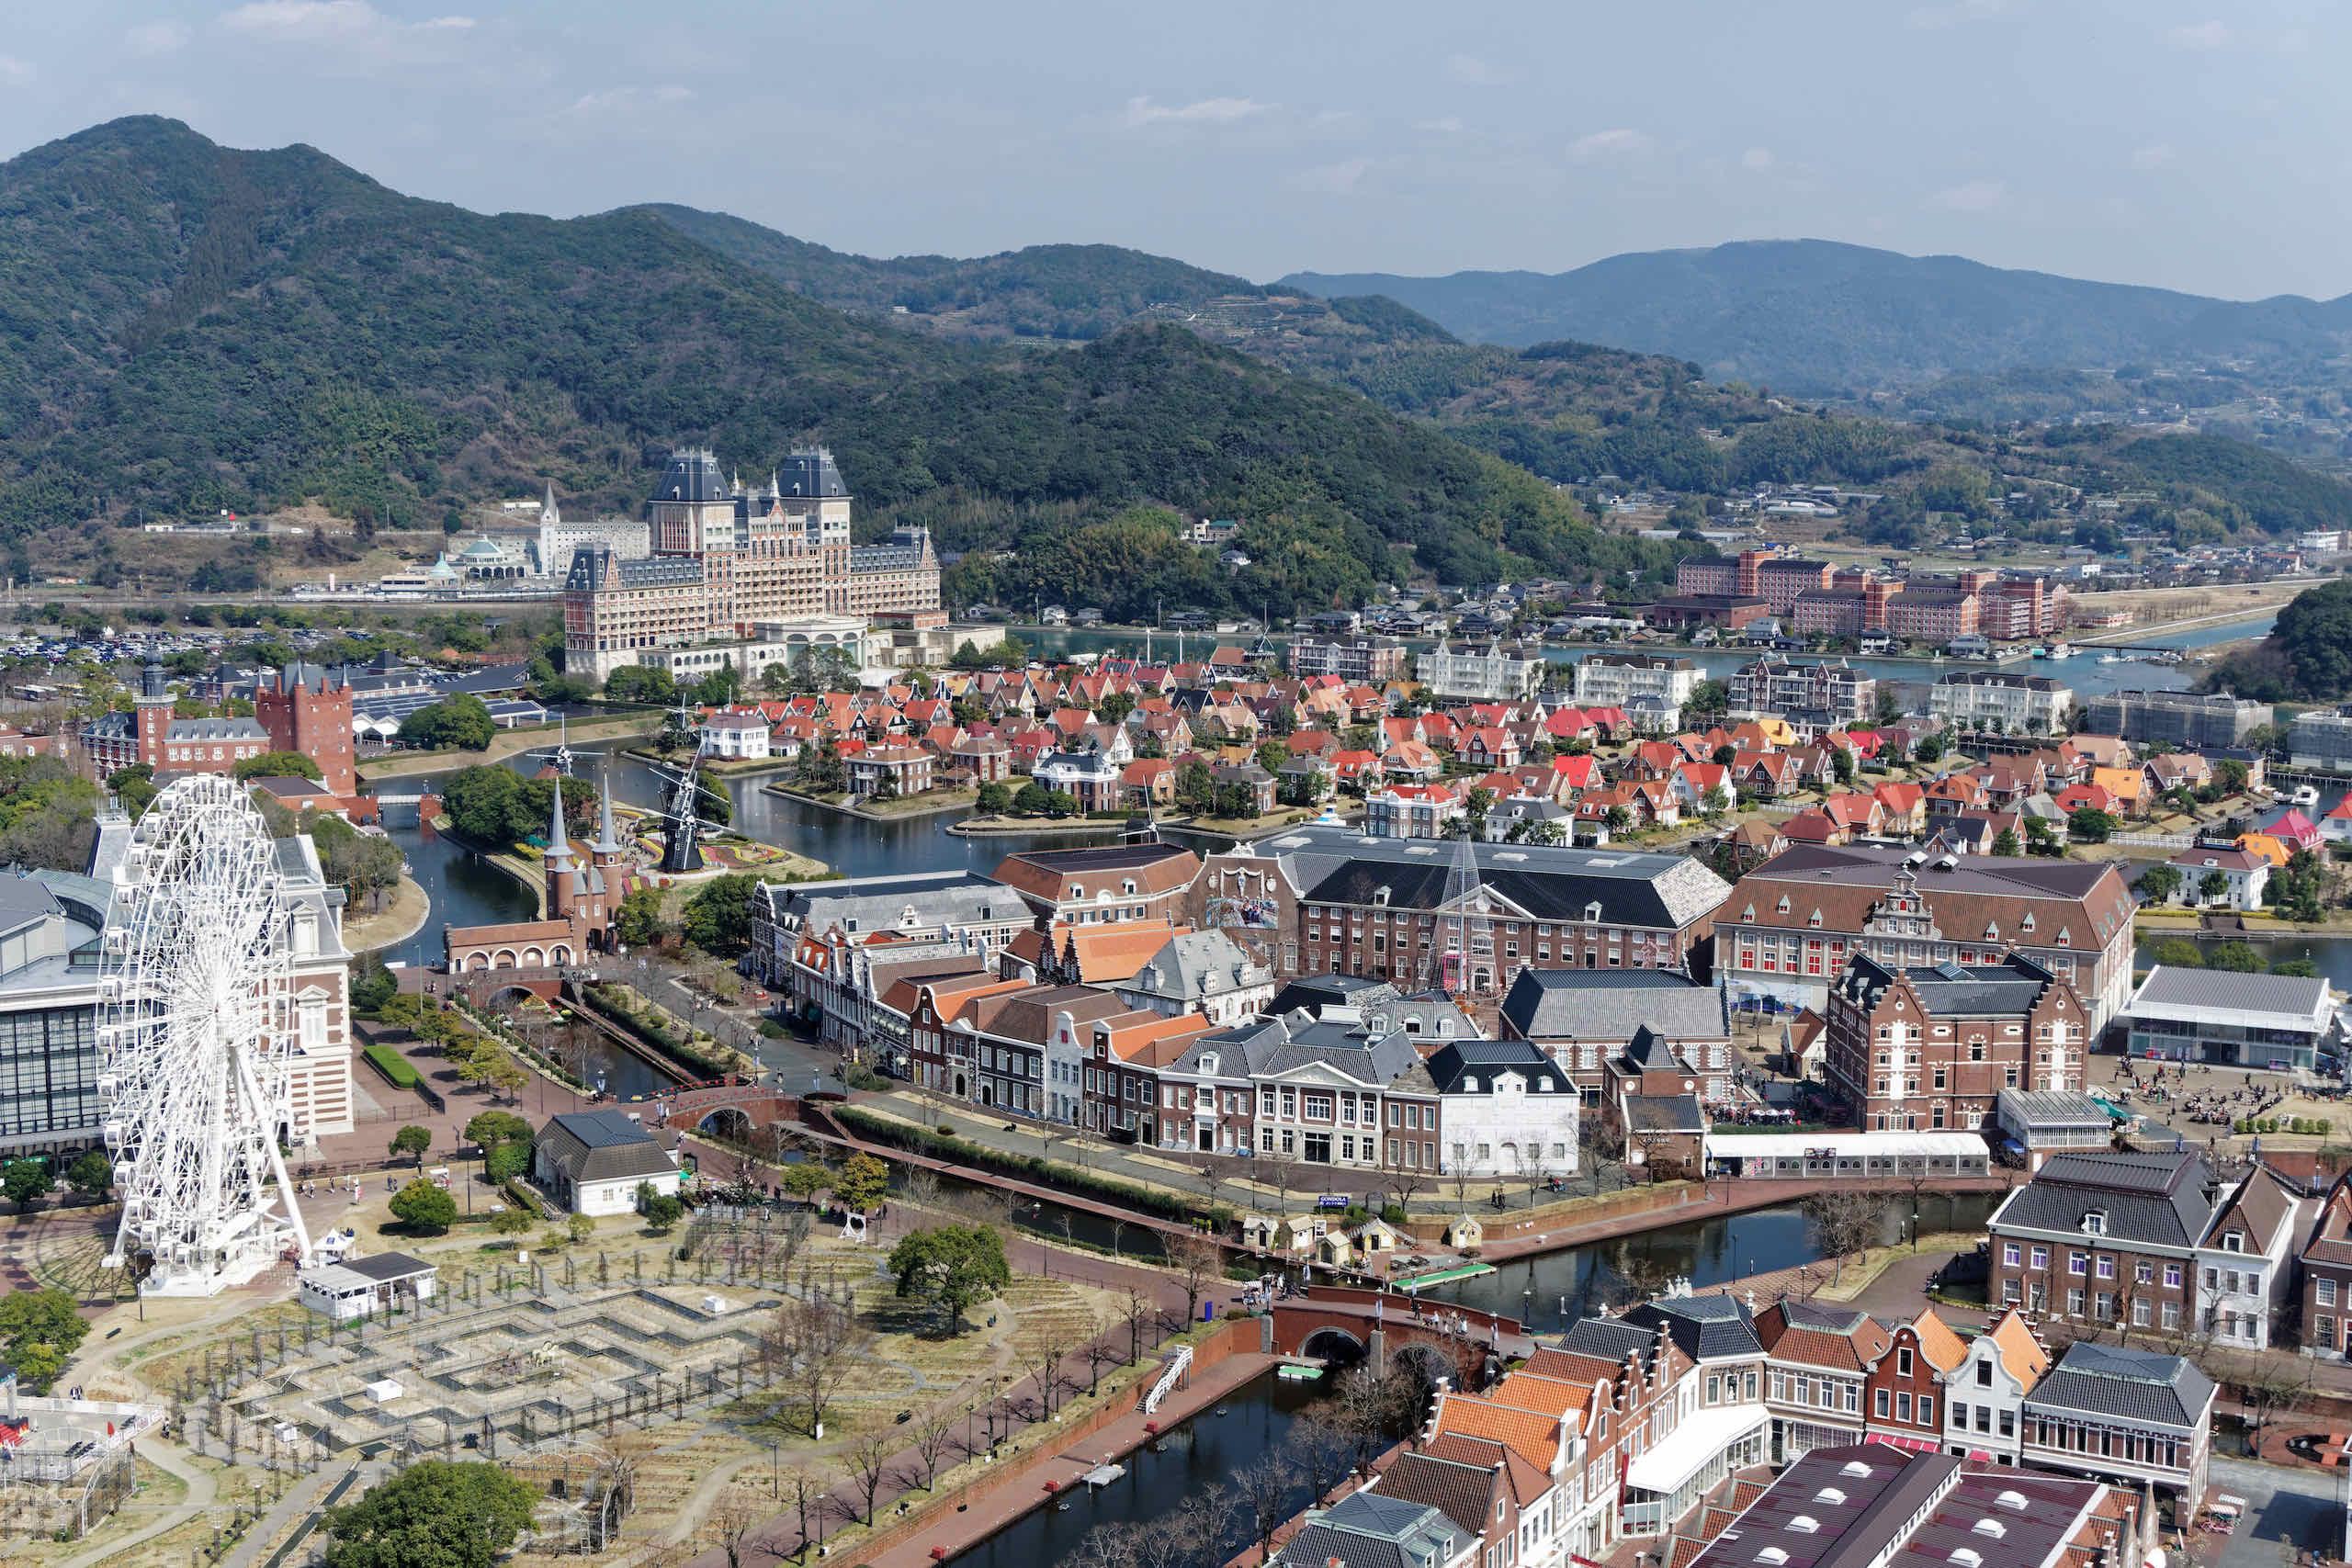 wassenaar and attraction town, ferris wheel